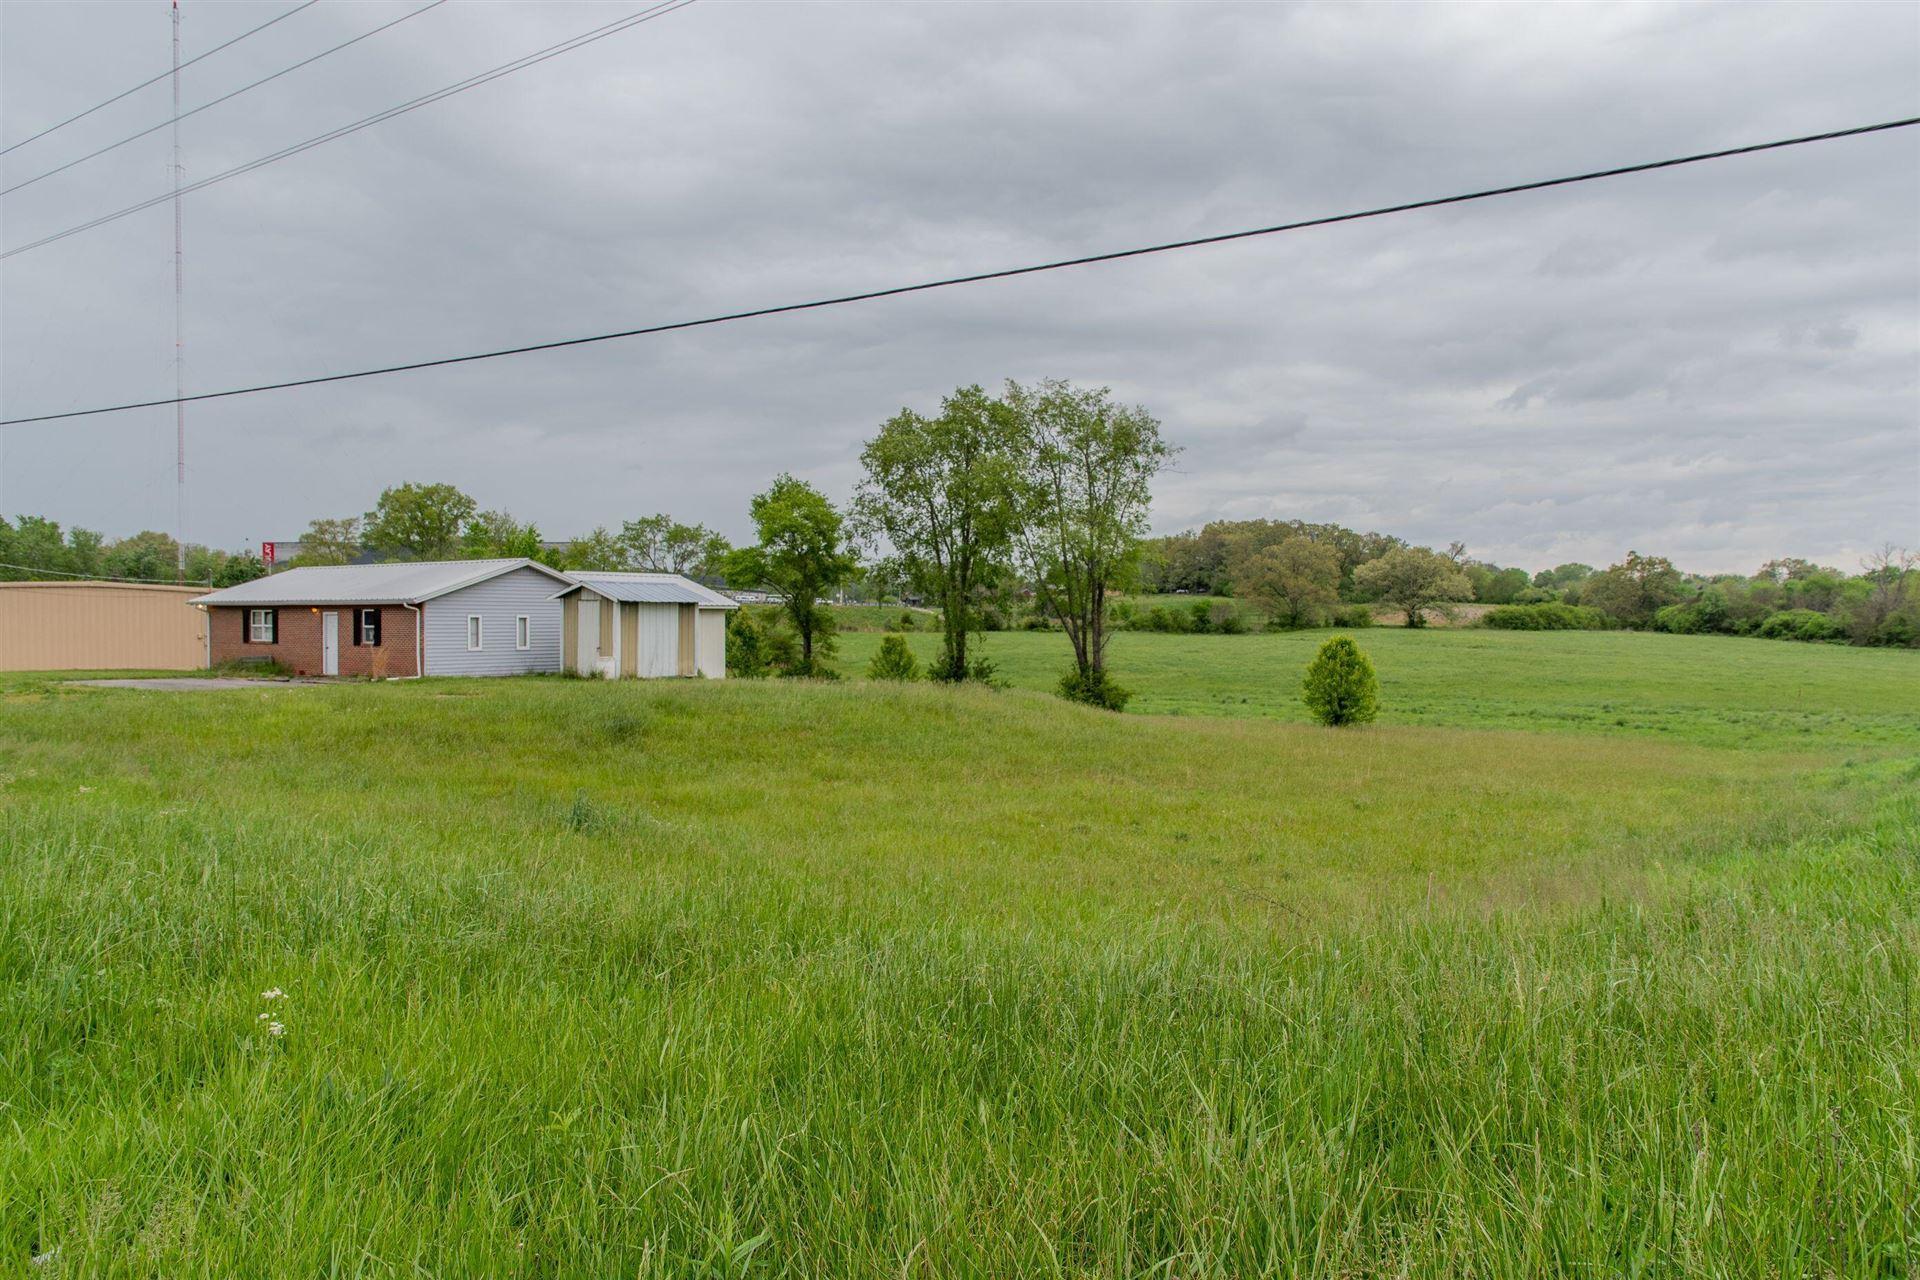 Photo of 486 N Spring St, Sparta, TN 38583 (MLS # 1151203)